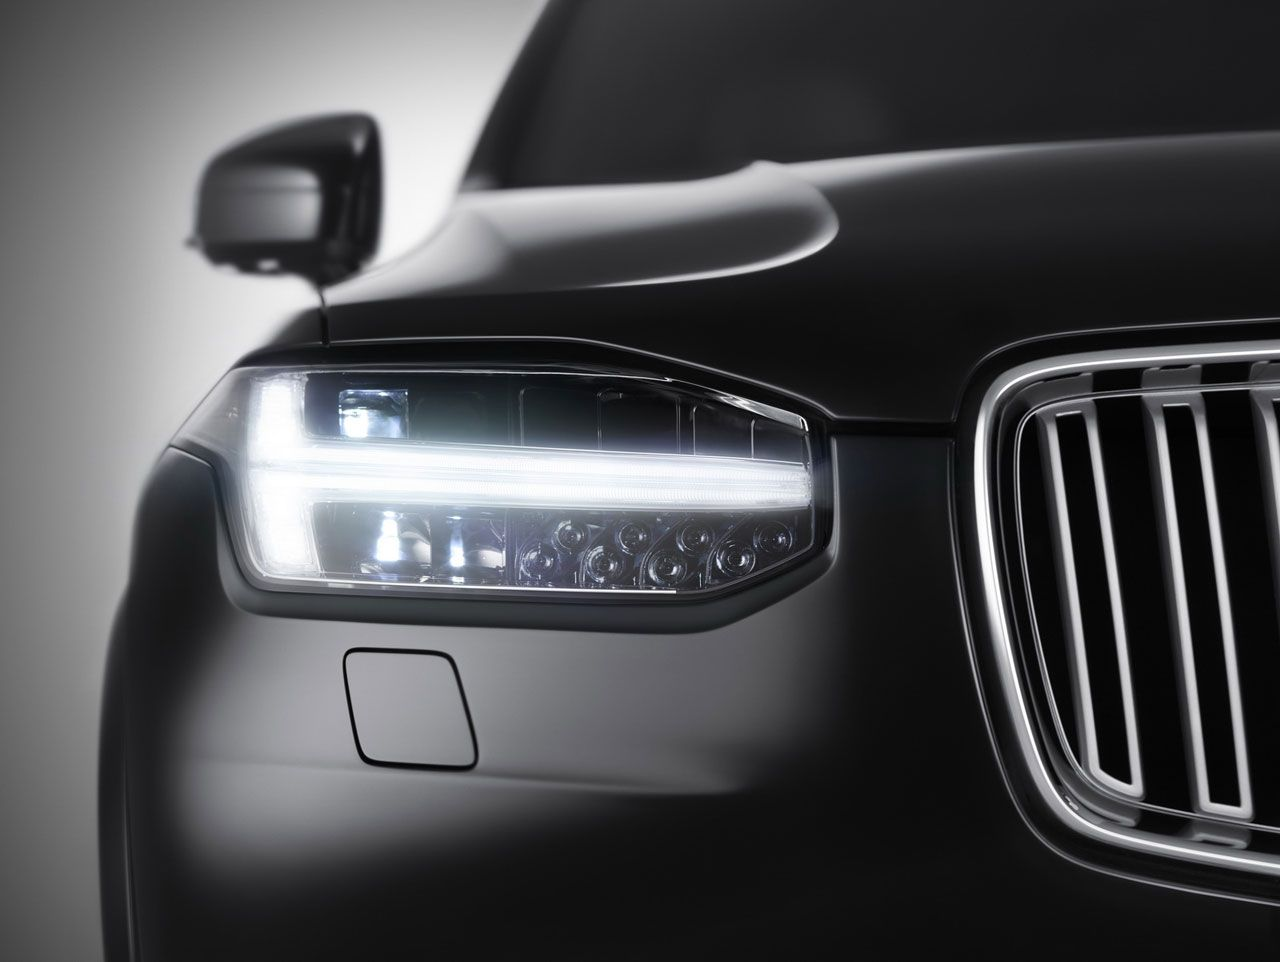 Volvo Xc90 Headlight Design Detail Farois Do Carro Volvo